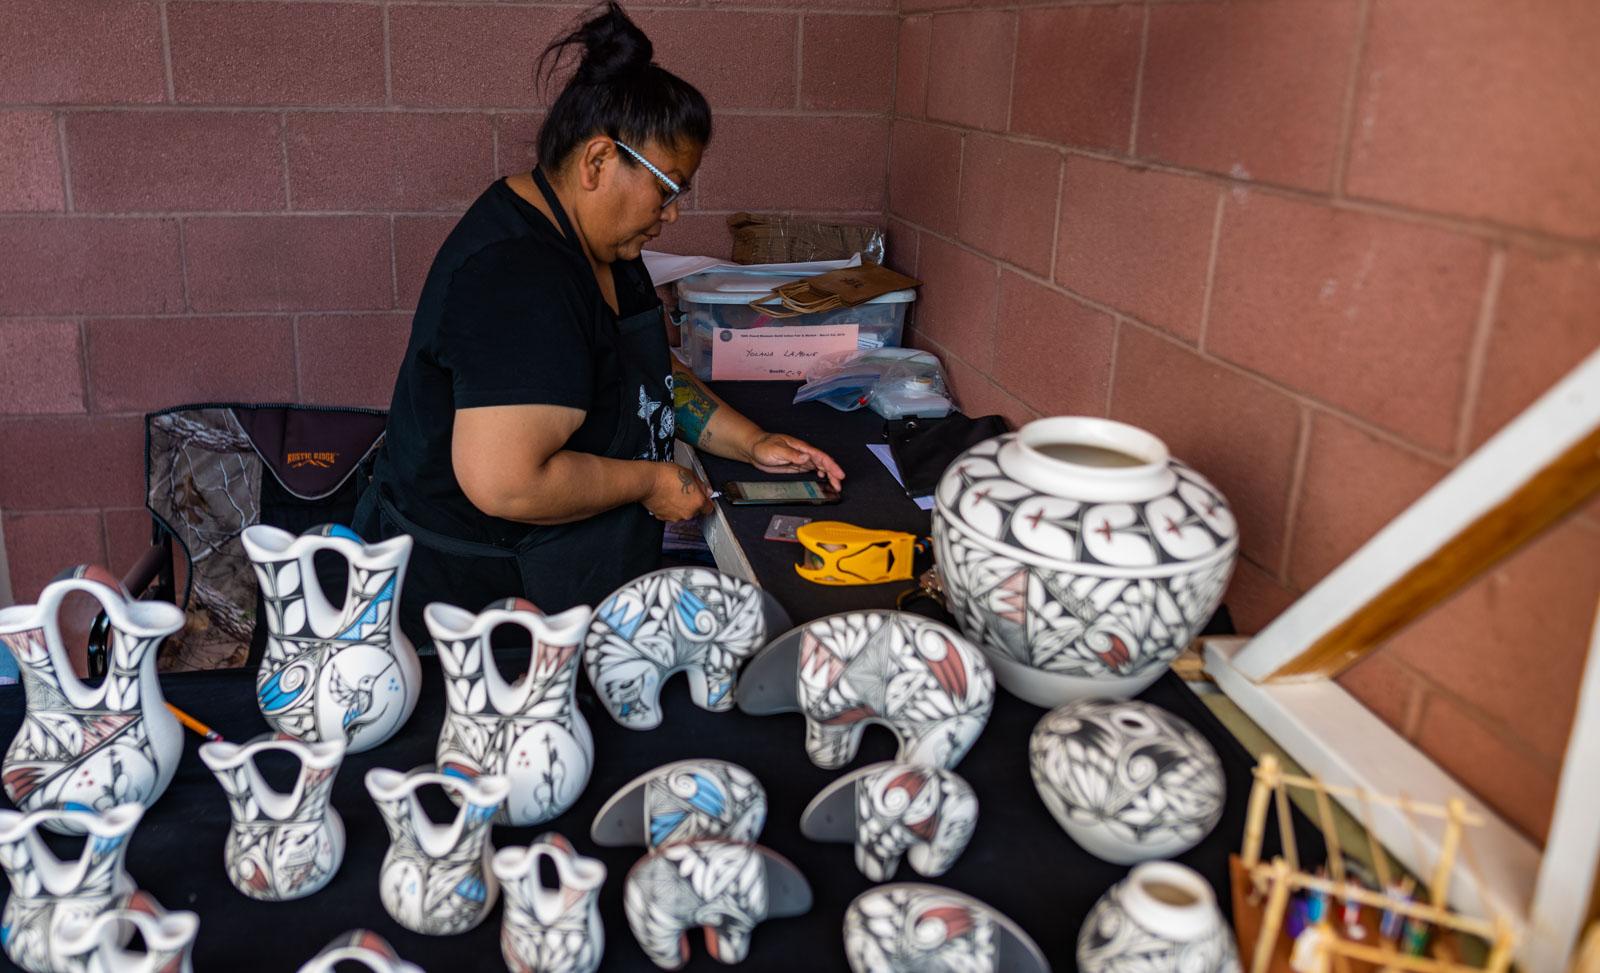 Navajo Potter where Carol bought a nativity scene